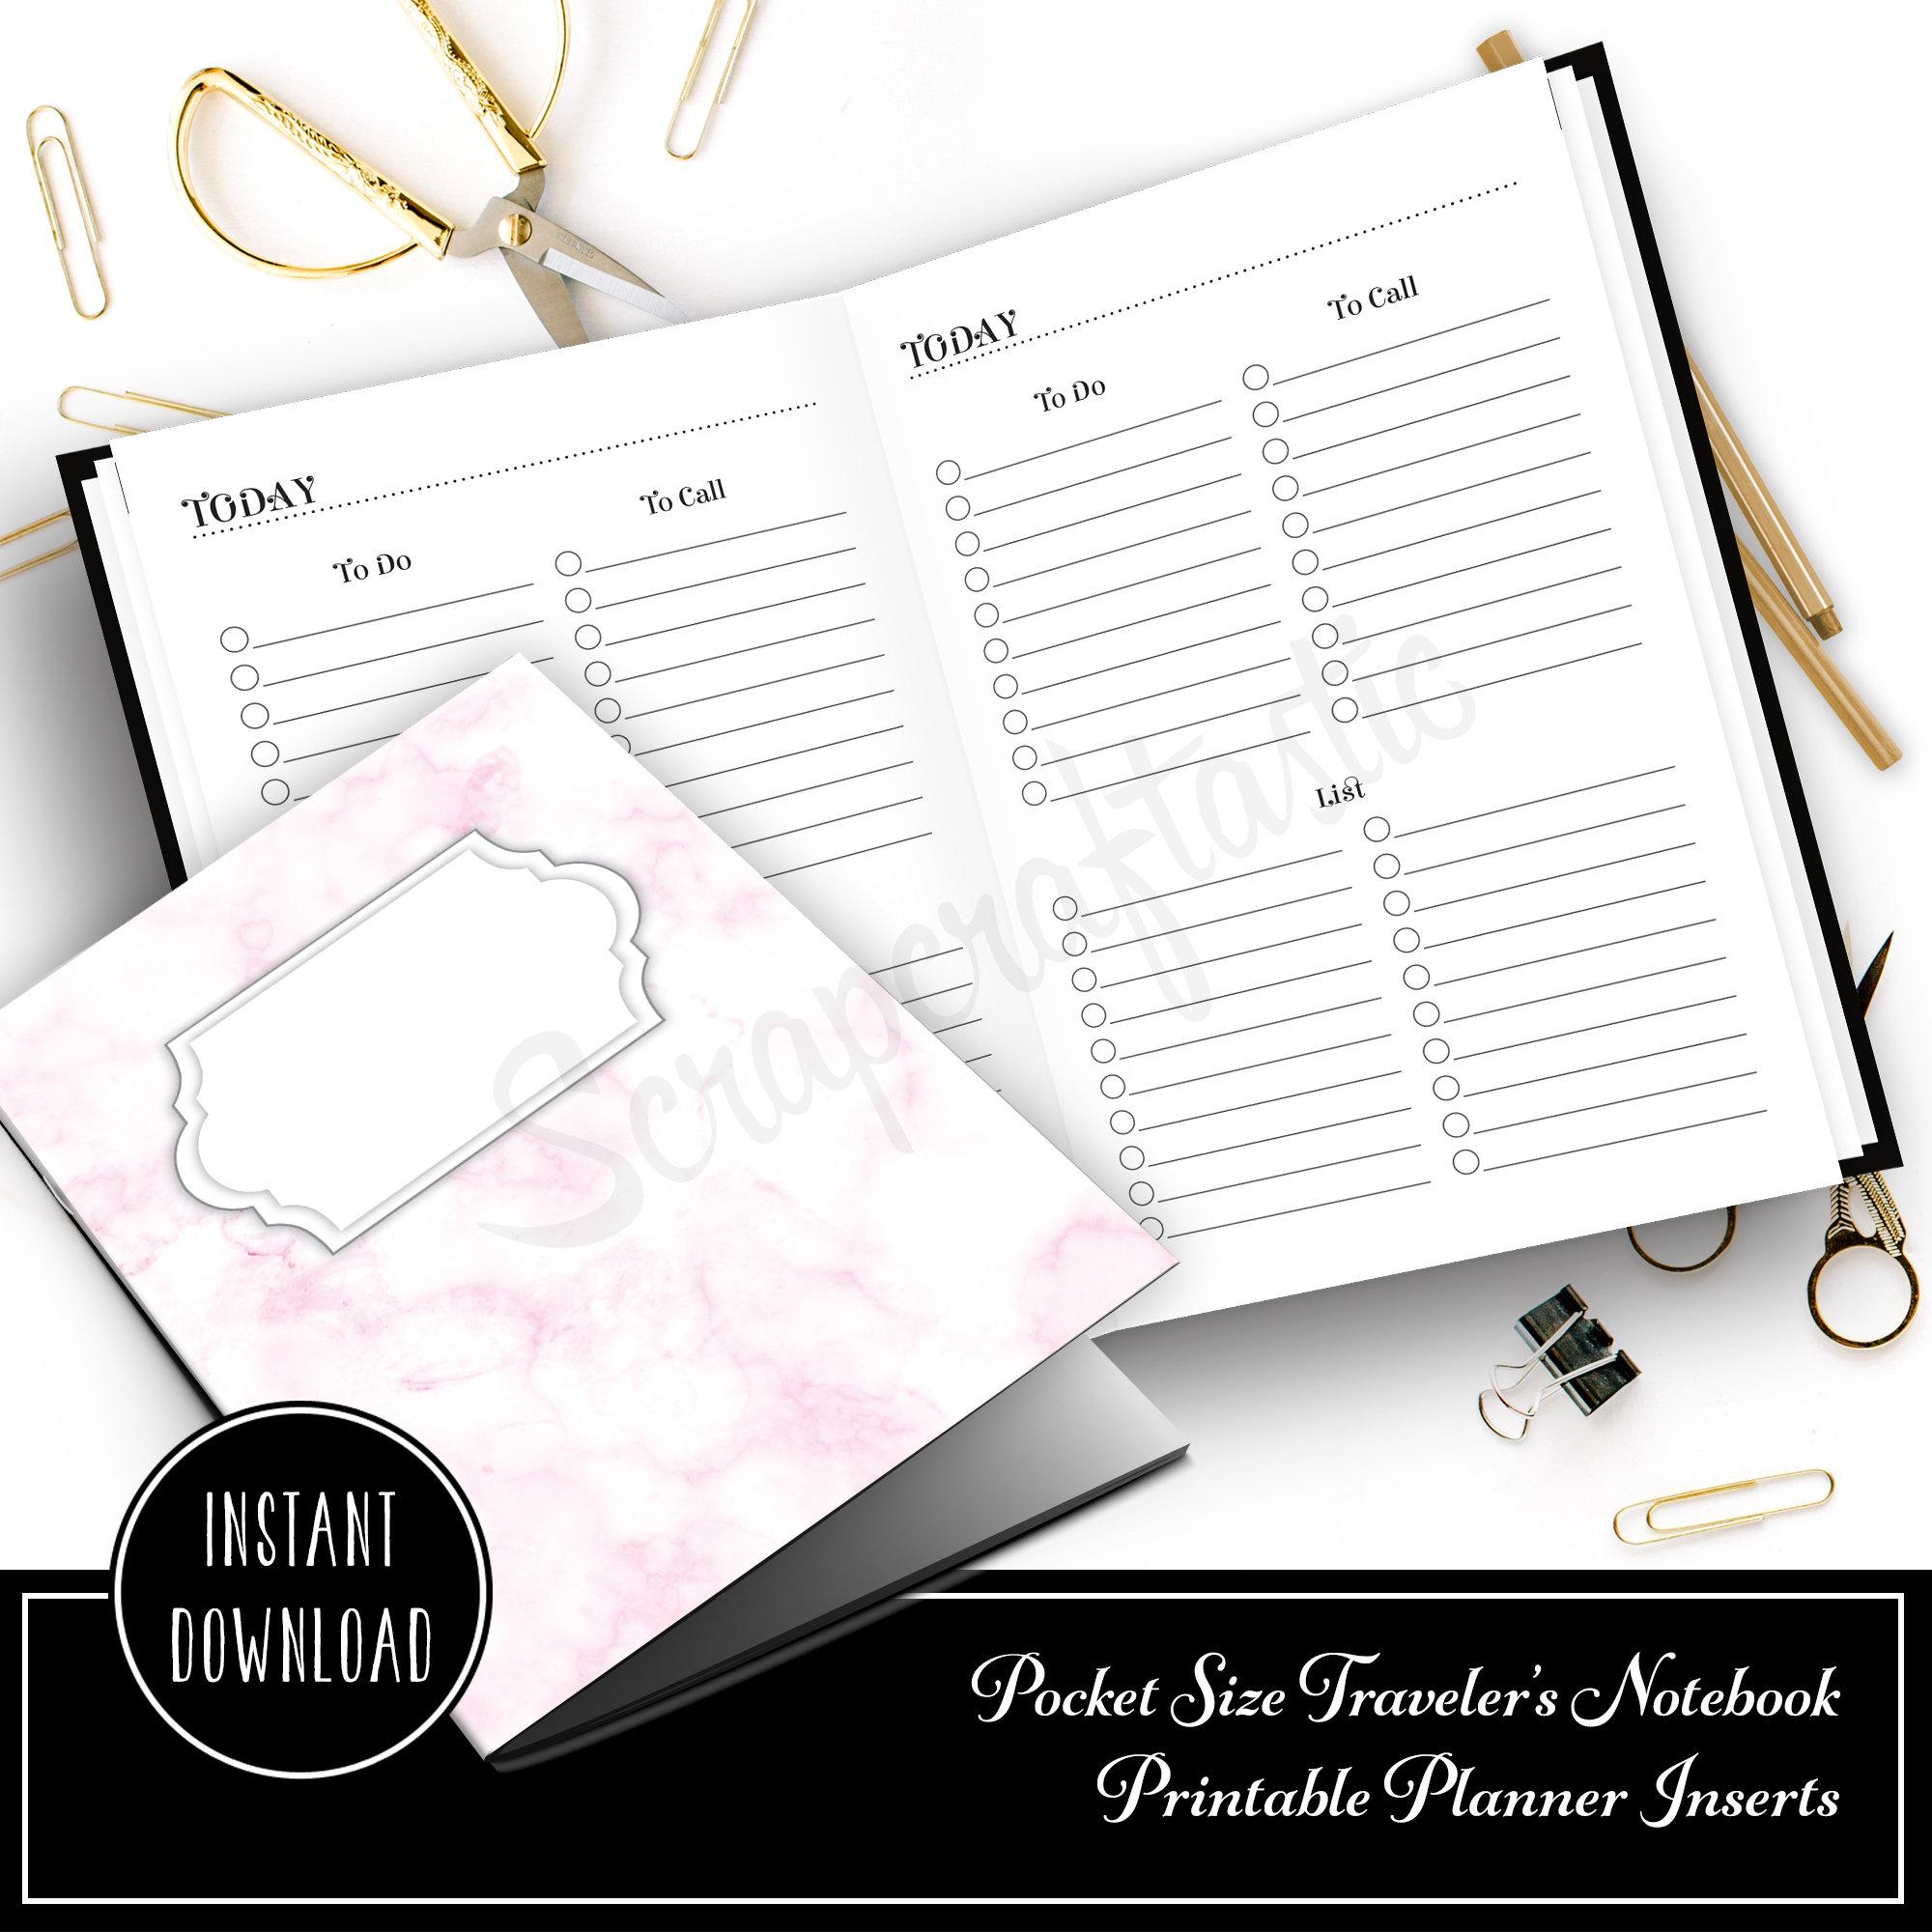 Multi List Pocket Size Traveler's Notebook Printable Planner Inserts 10016